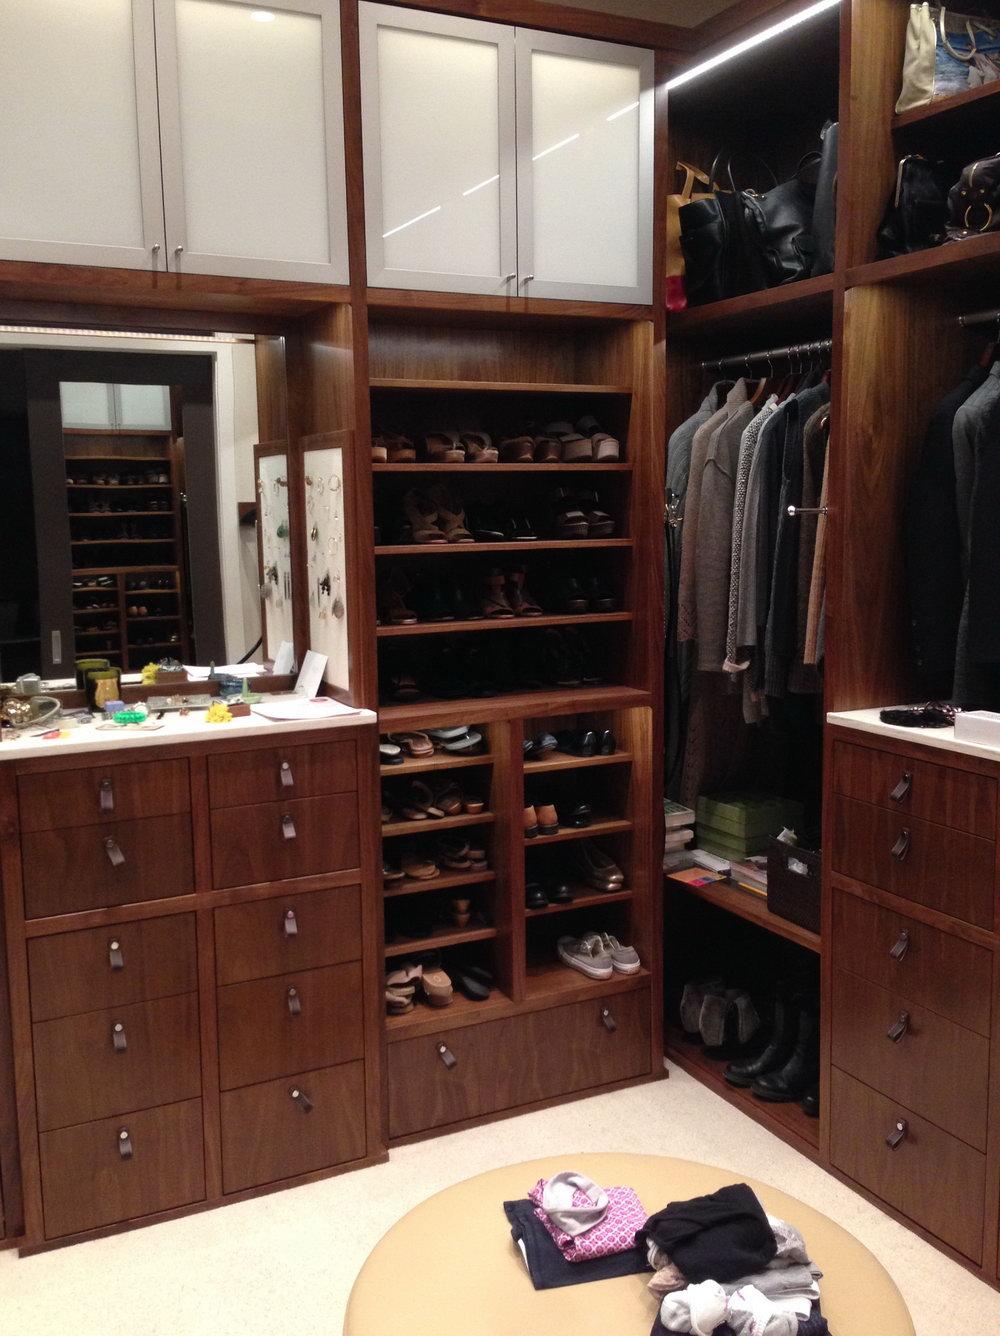 Top Shelf Closets & Cabinetry Inc